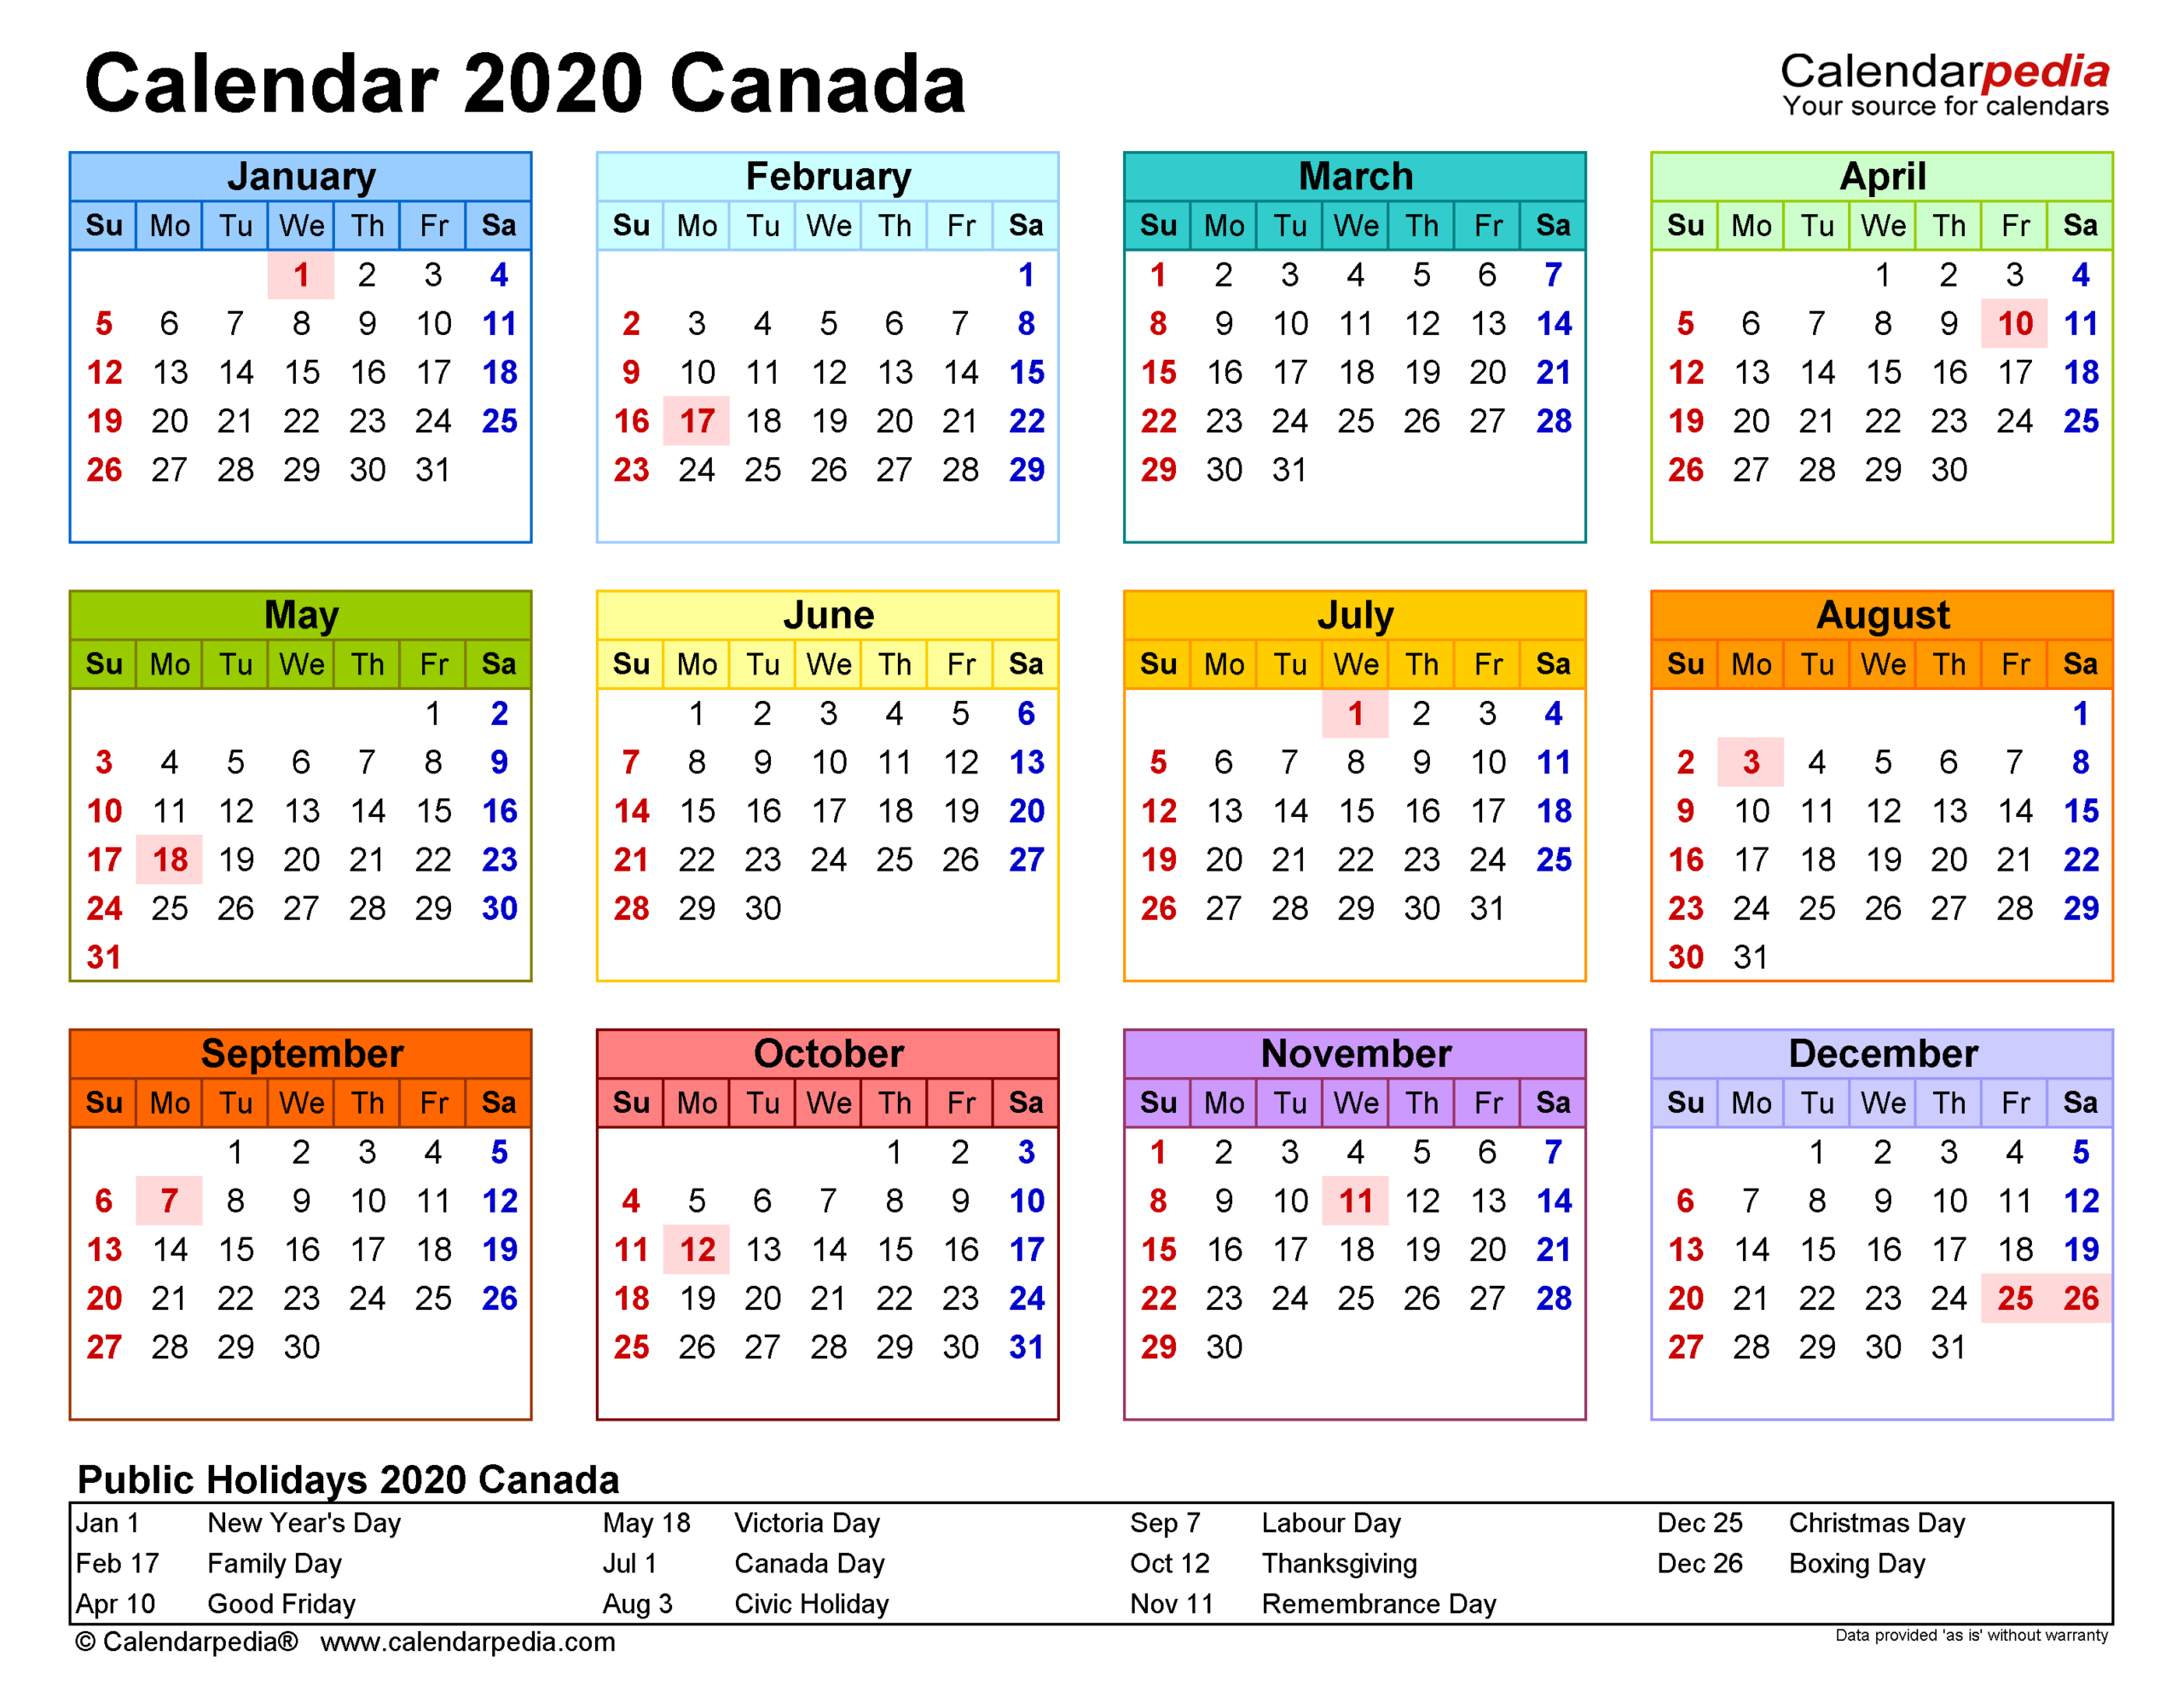 Canada Calendar 2020 - Free Printable Pdf Templates